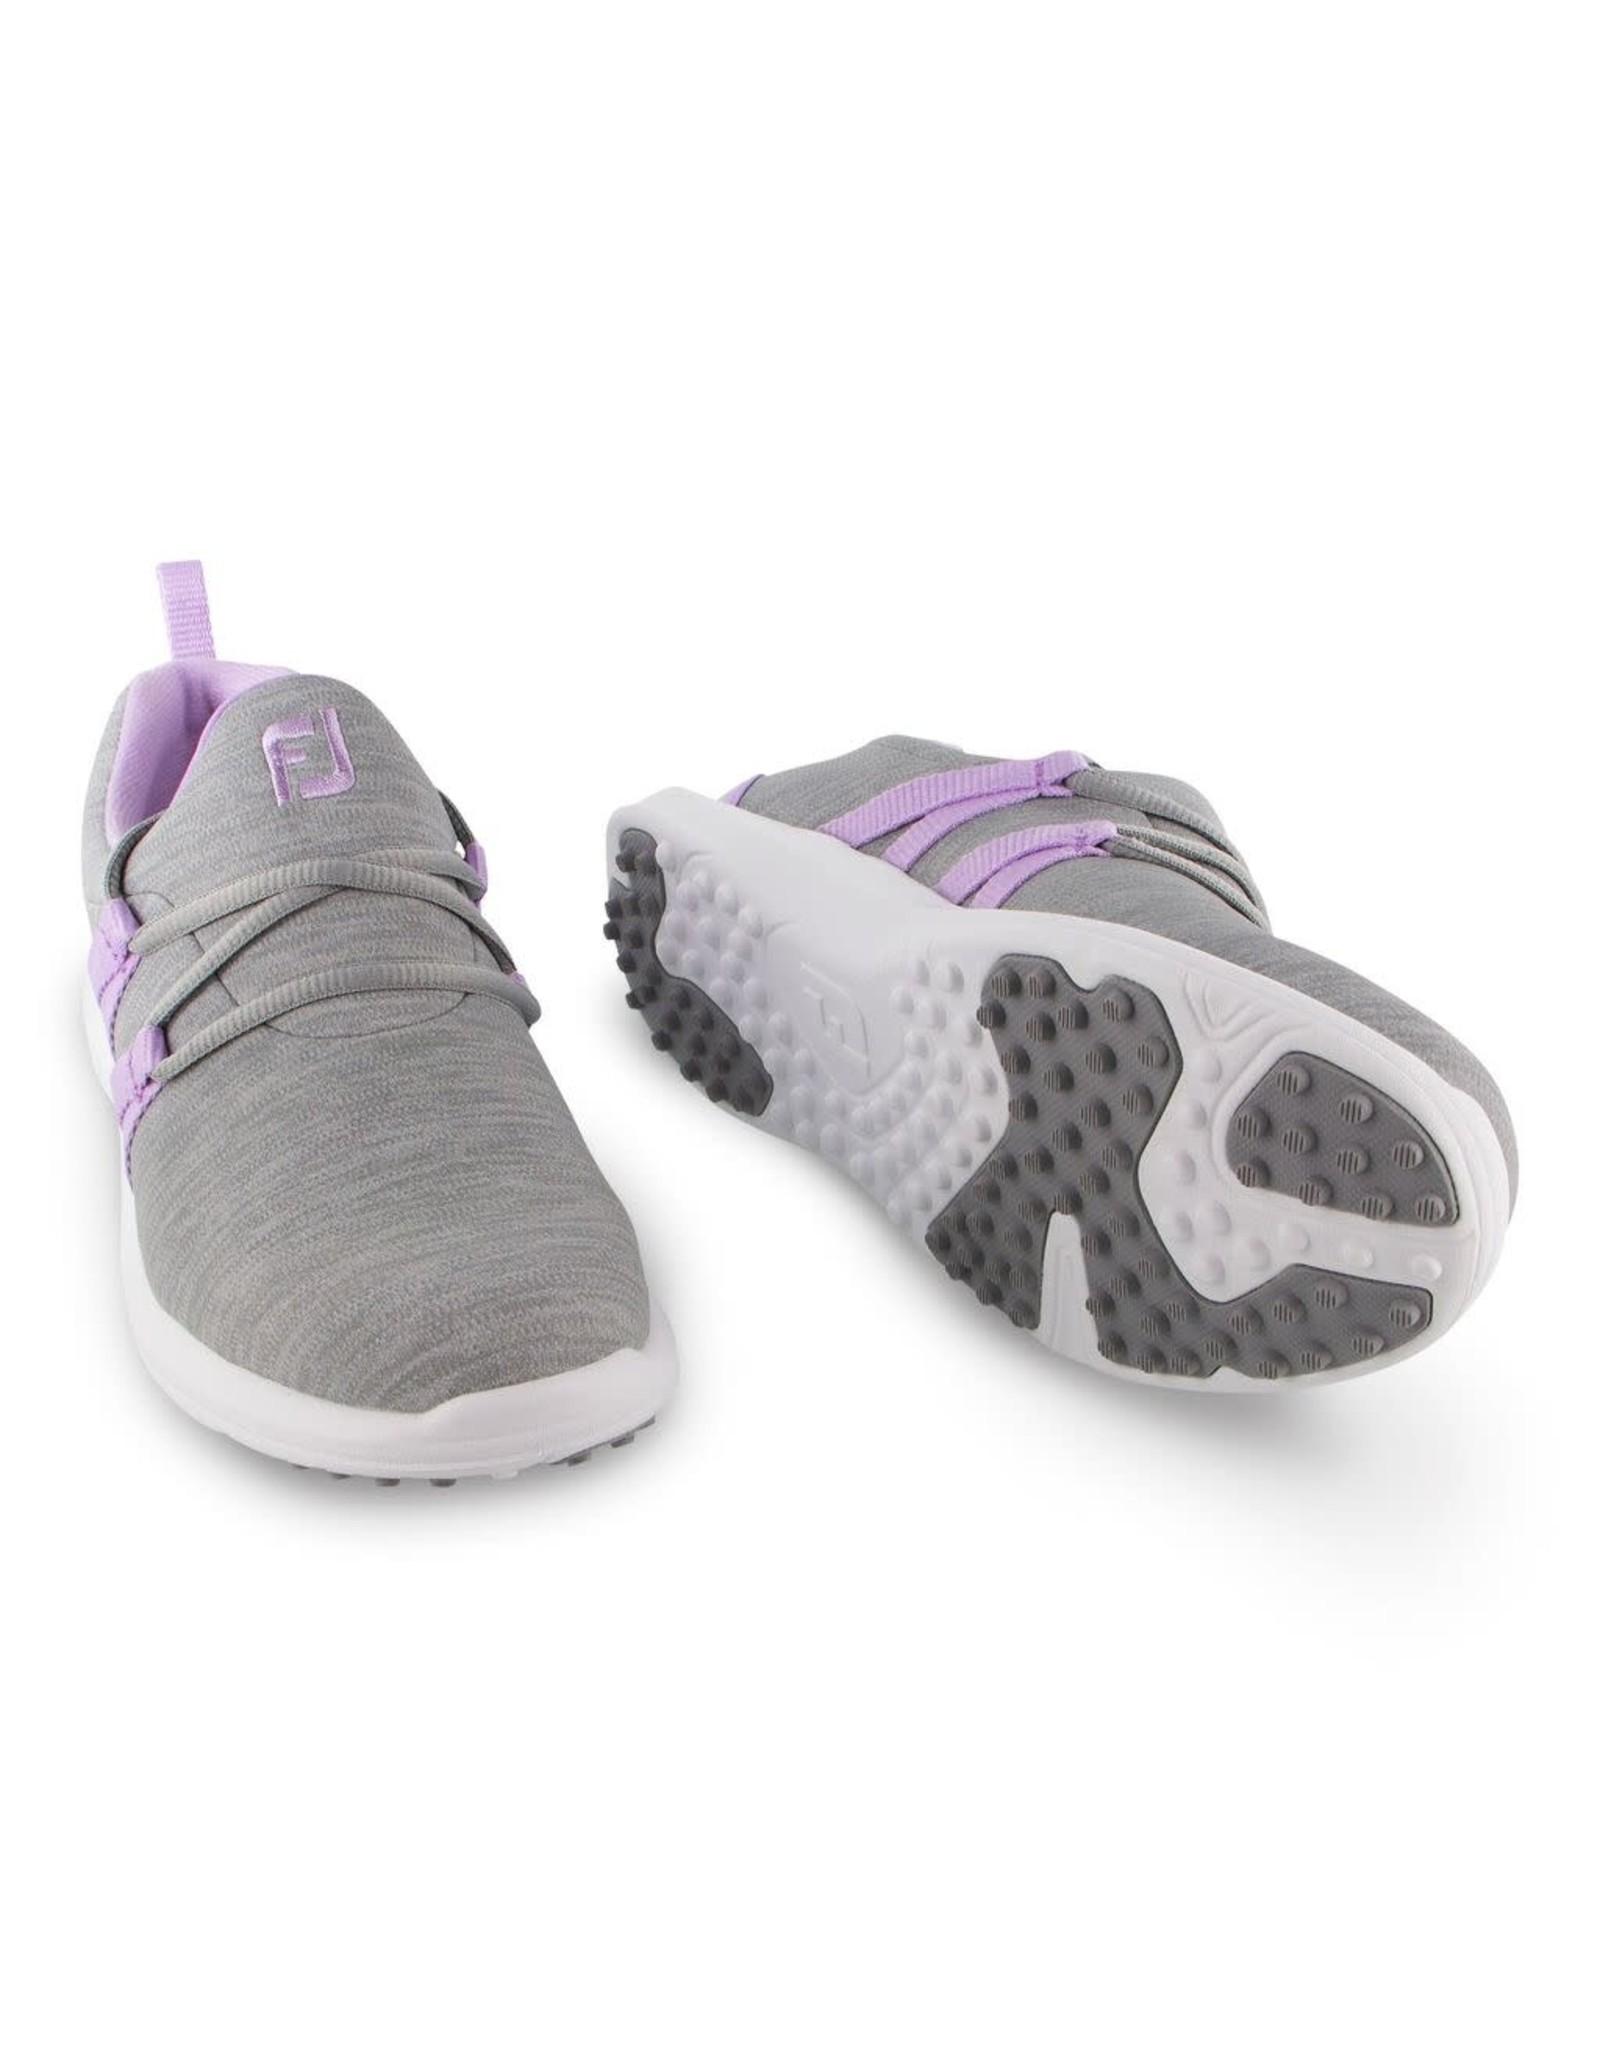 FJ FJ Leisure Slip-On Women's Grey and Pink